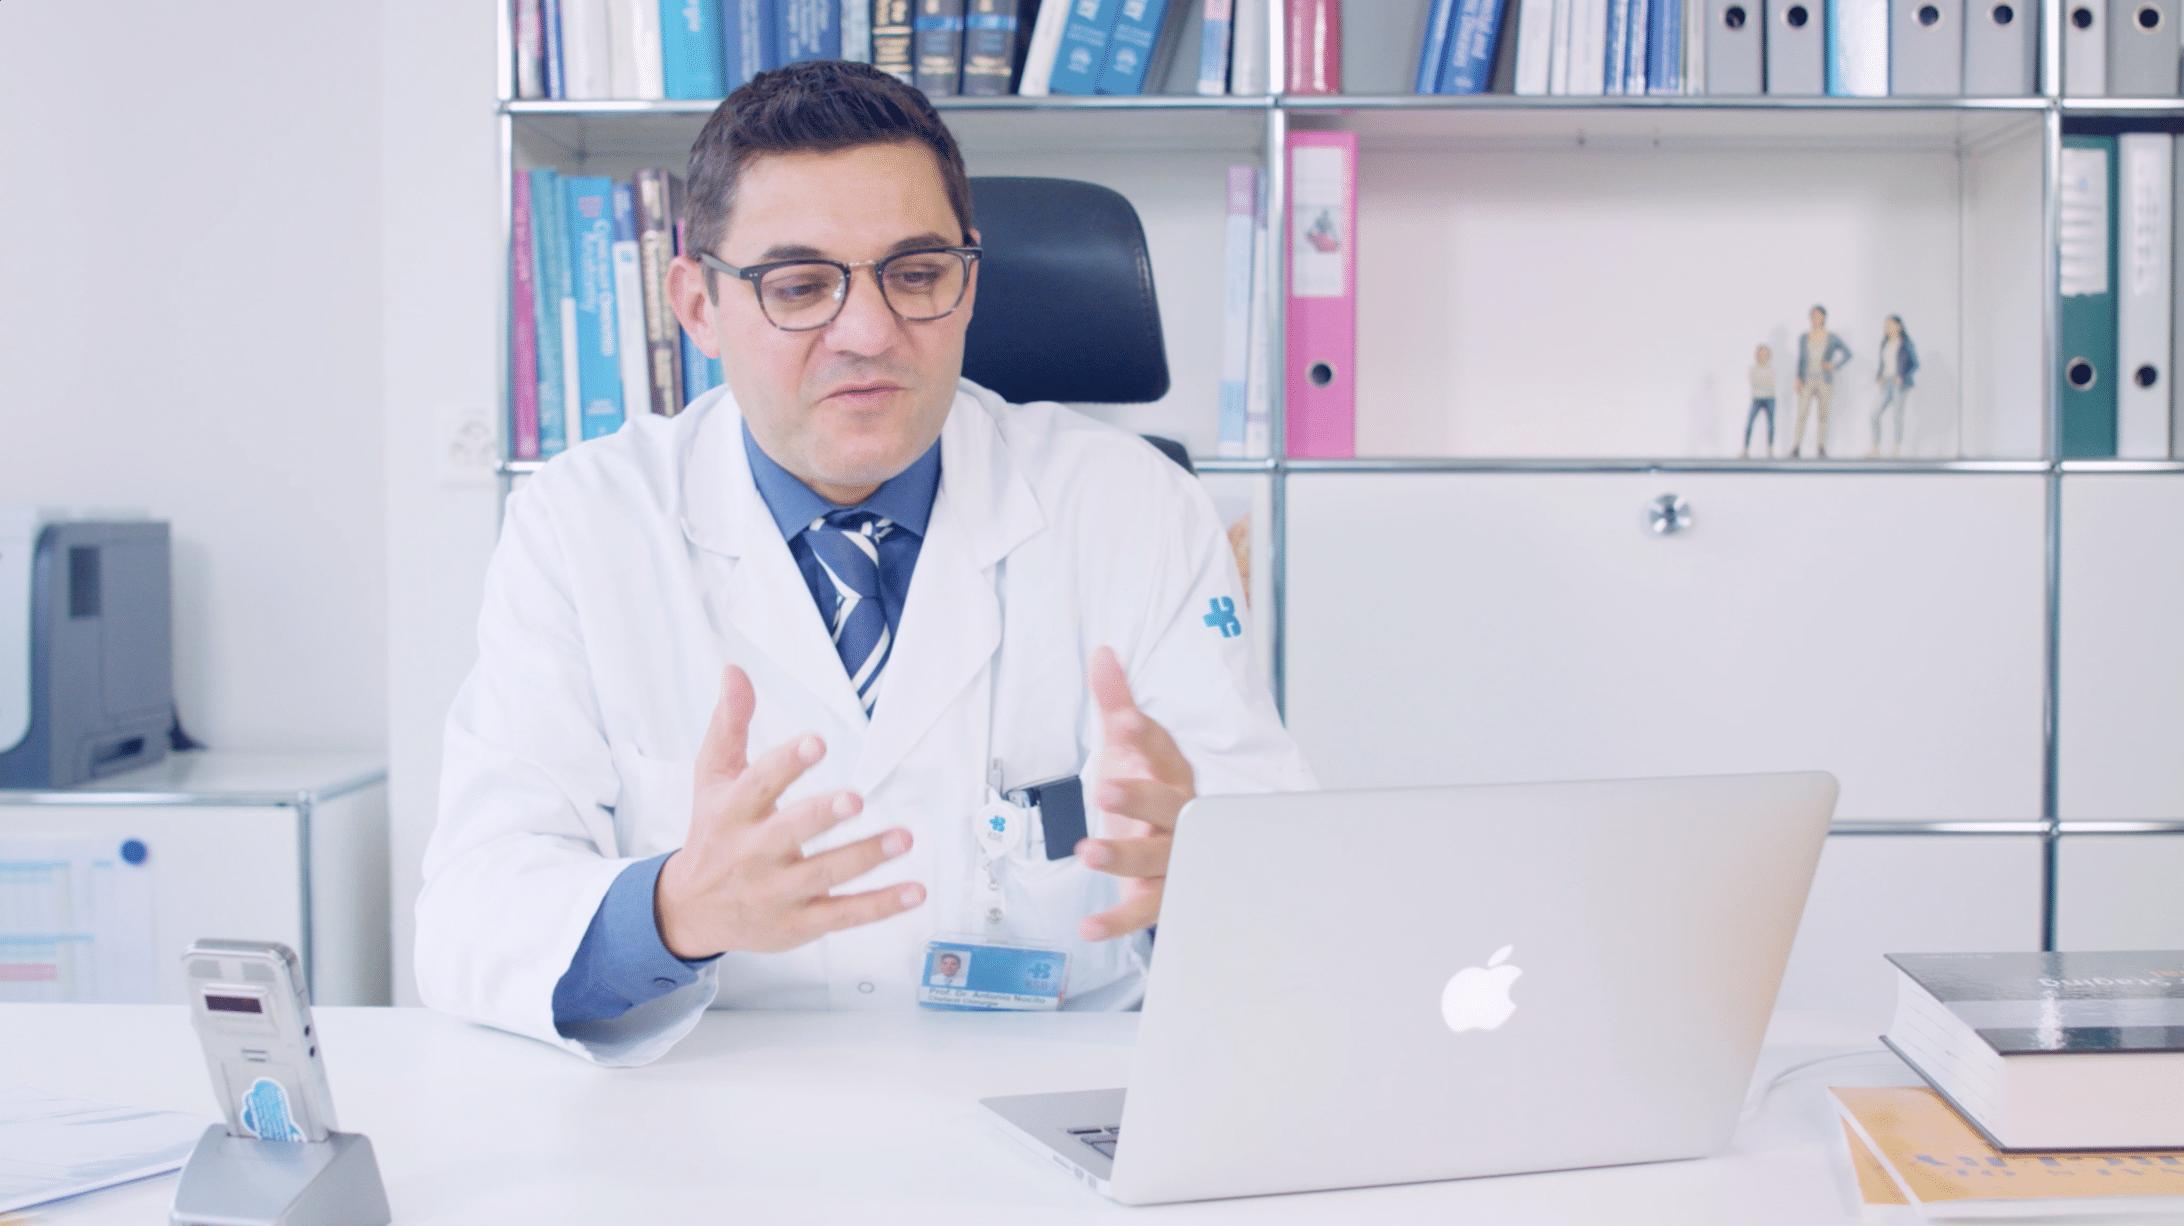 Prof. Dr. med. A. Nocito am Laptop